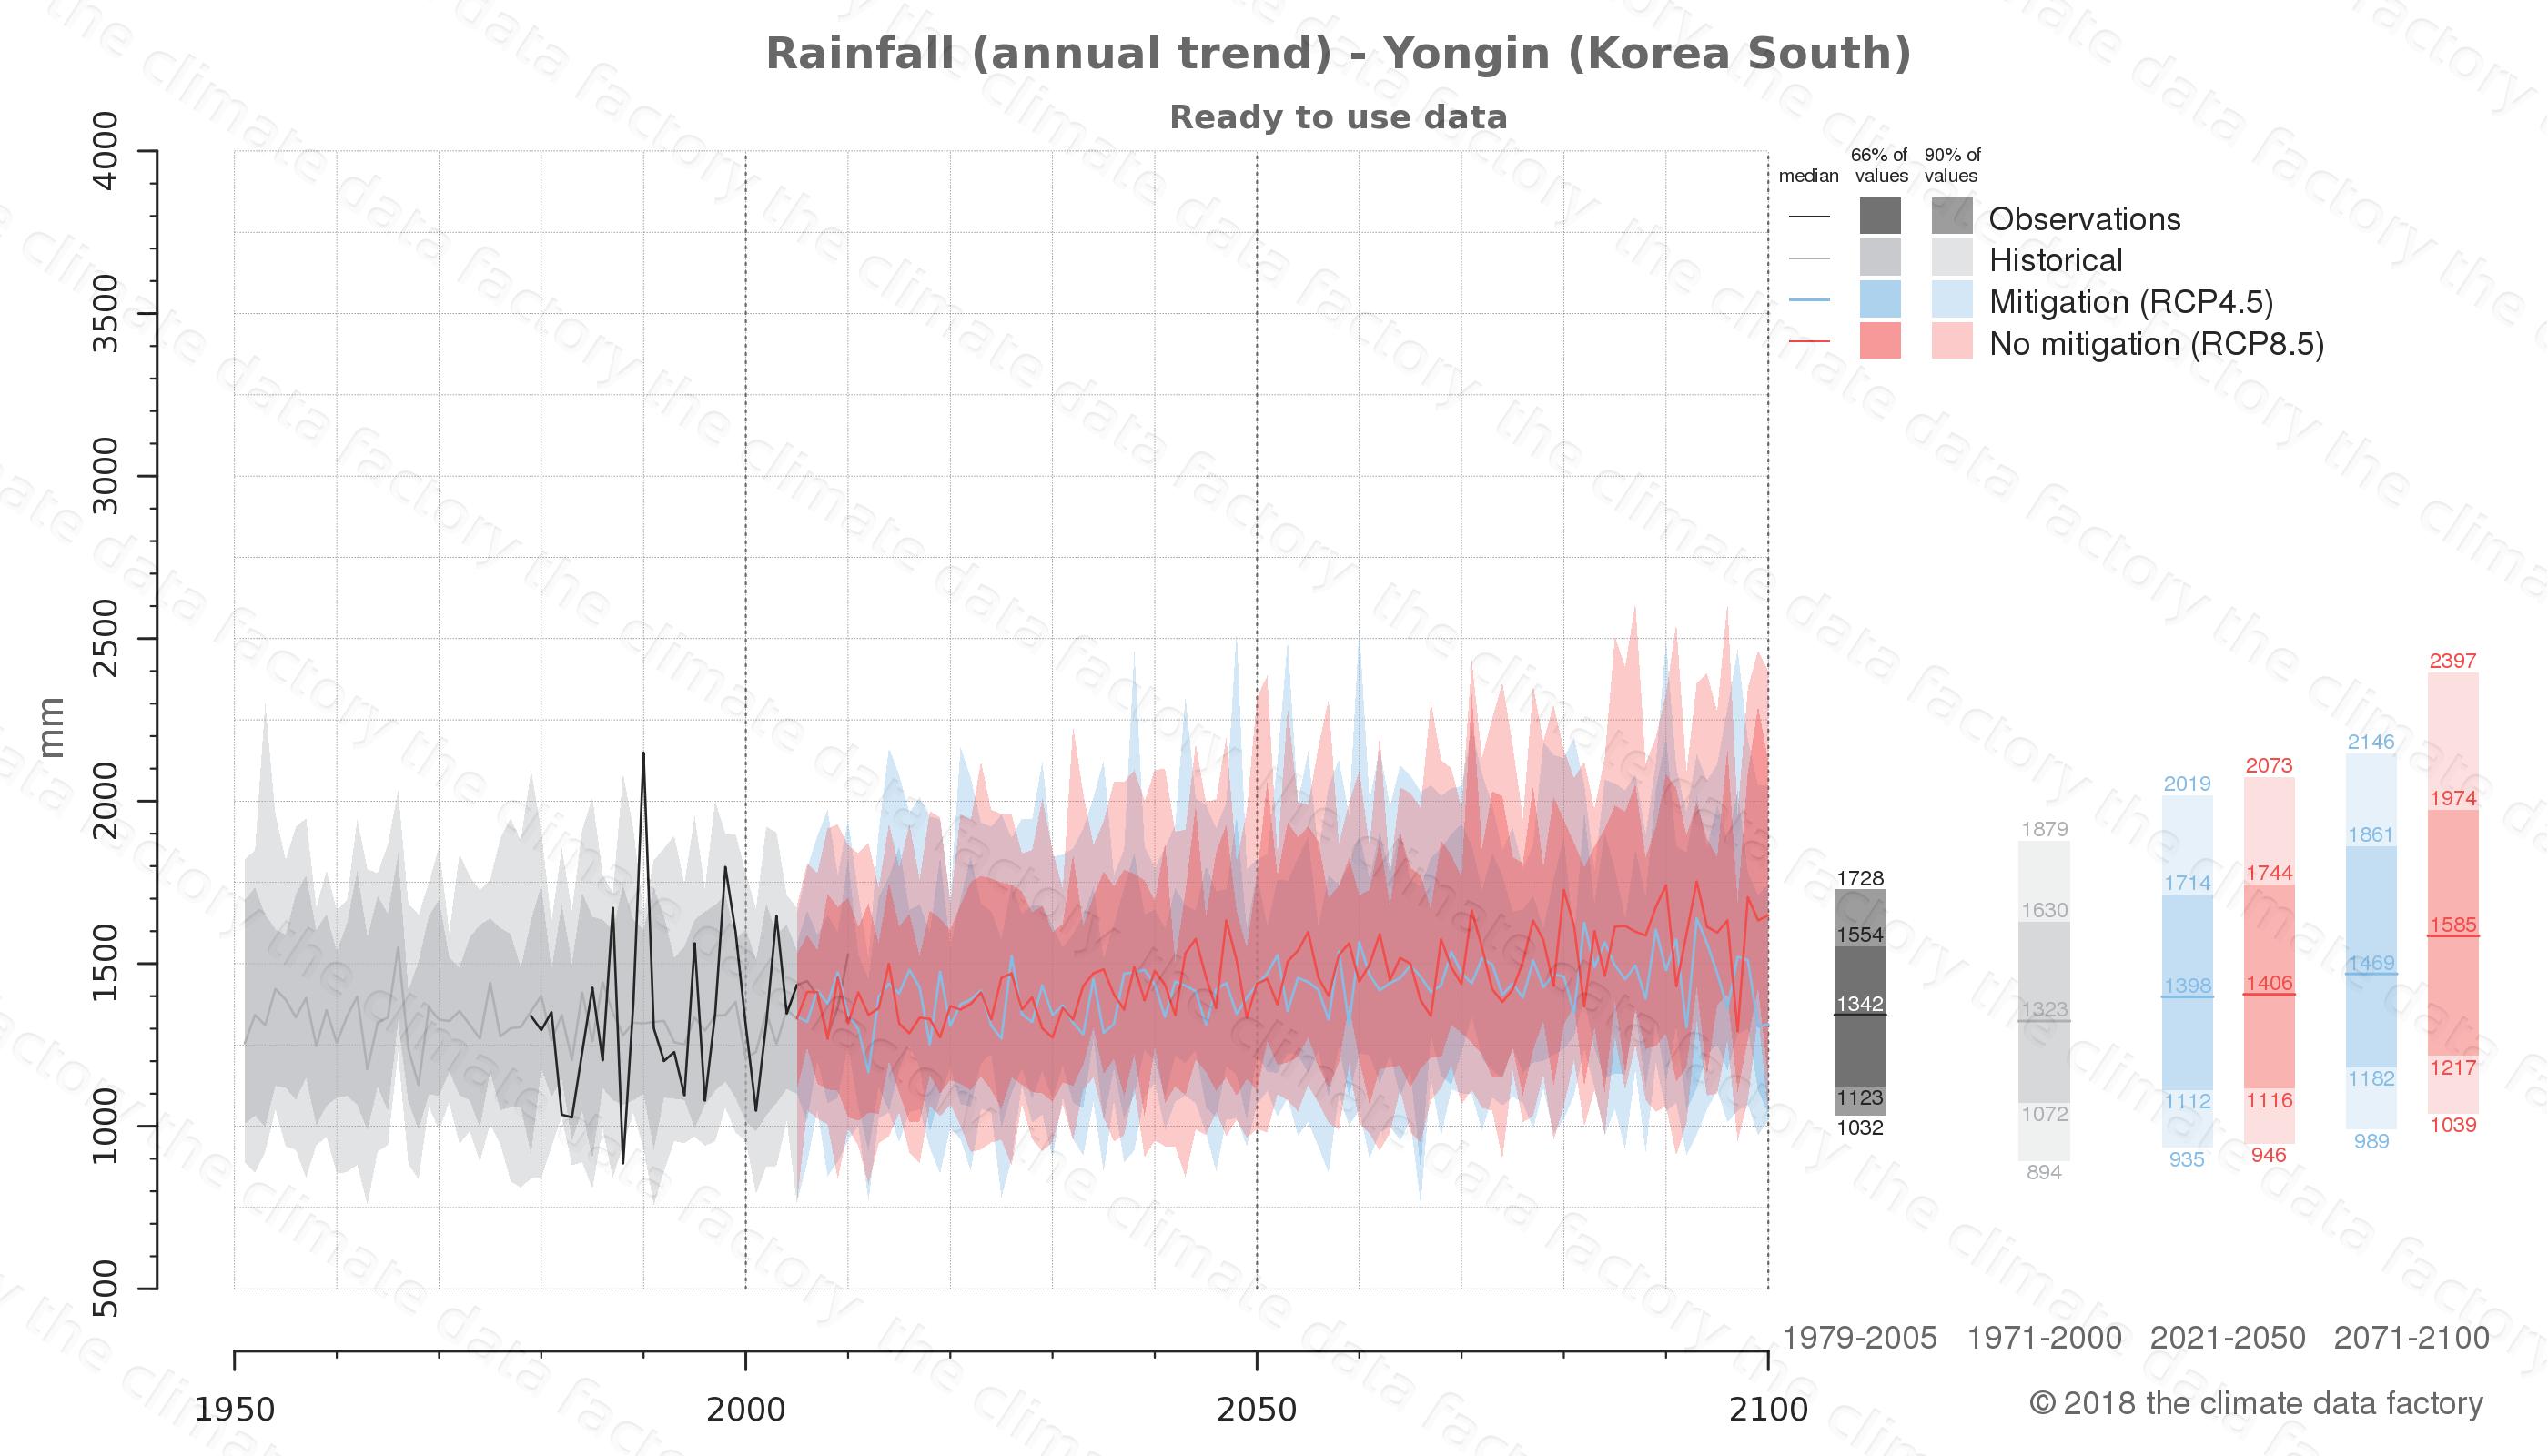 climate change data policy adaptation climate graph city data rainfall yongin south korea